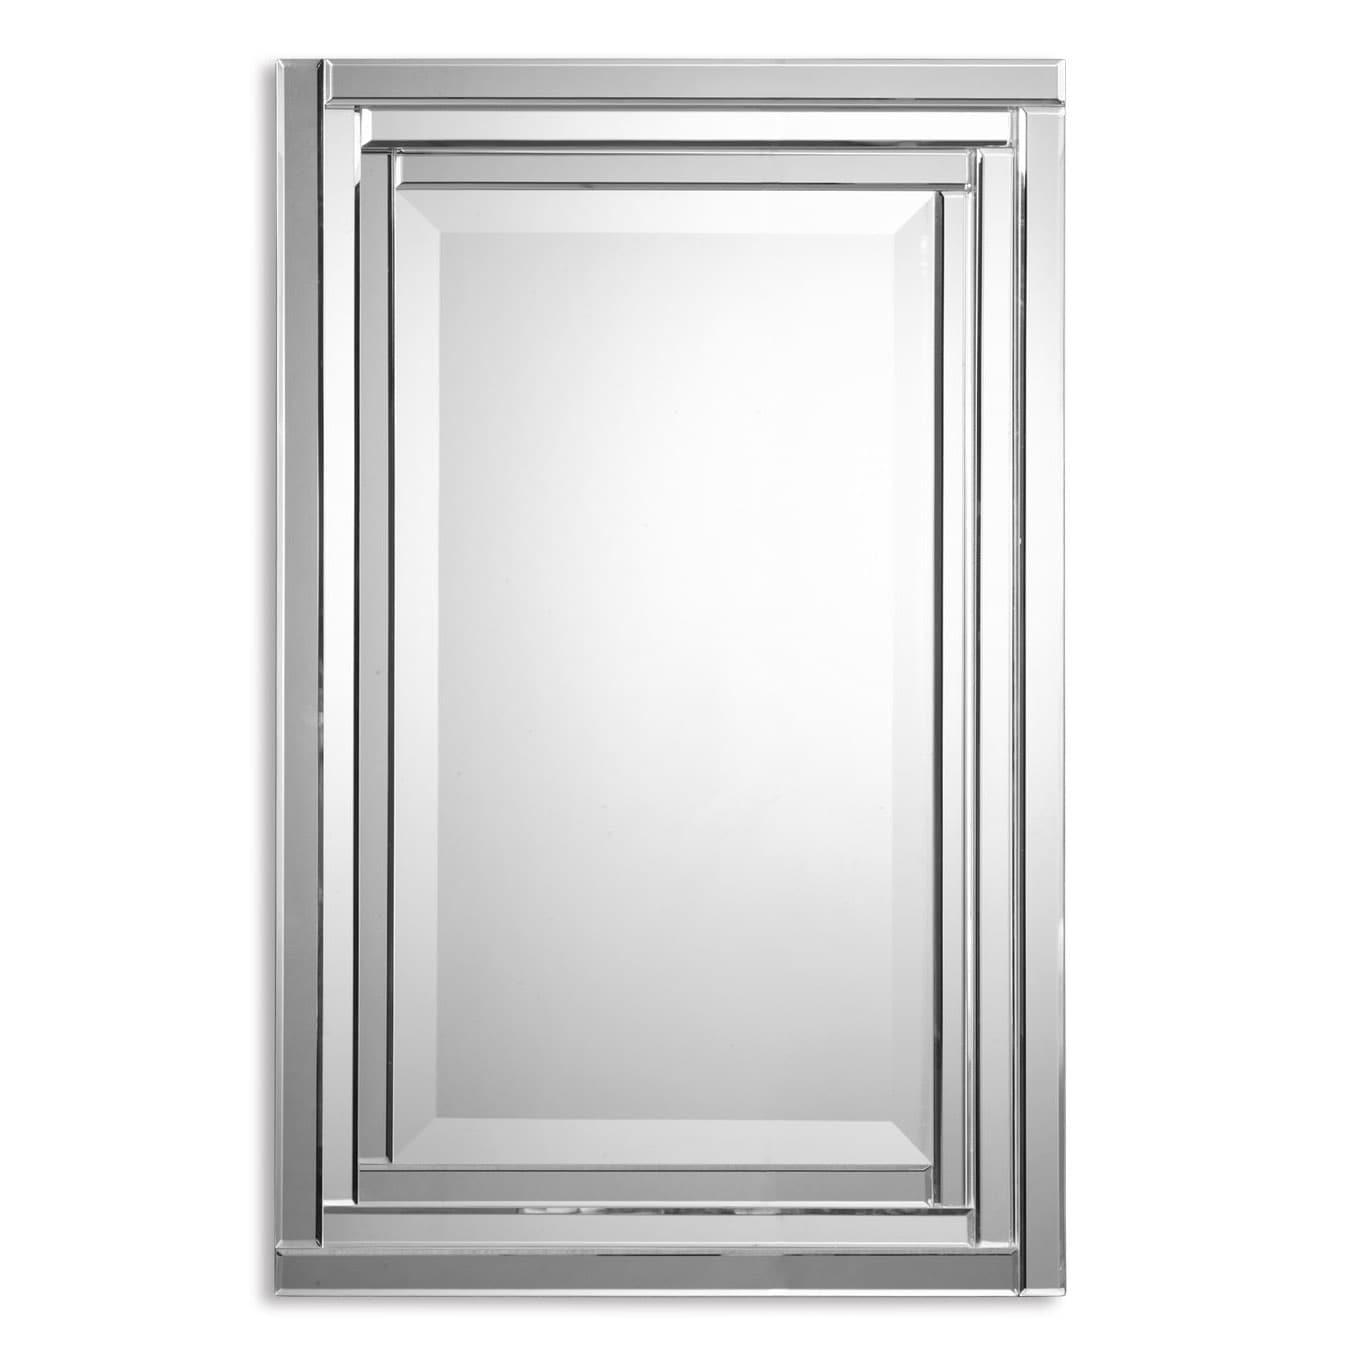 Overstock Mirrors: Uttermost 'Alanna' Frameless Vanity Mirror